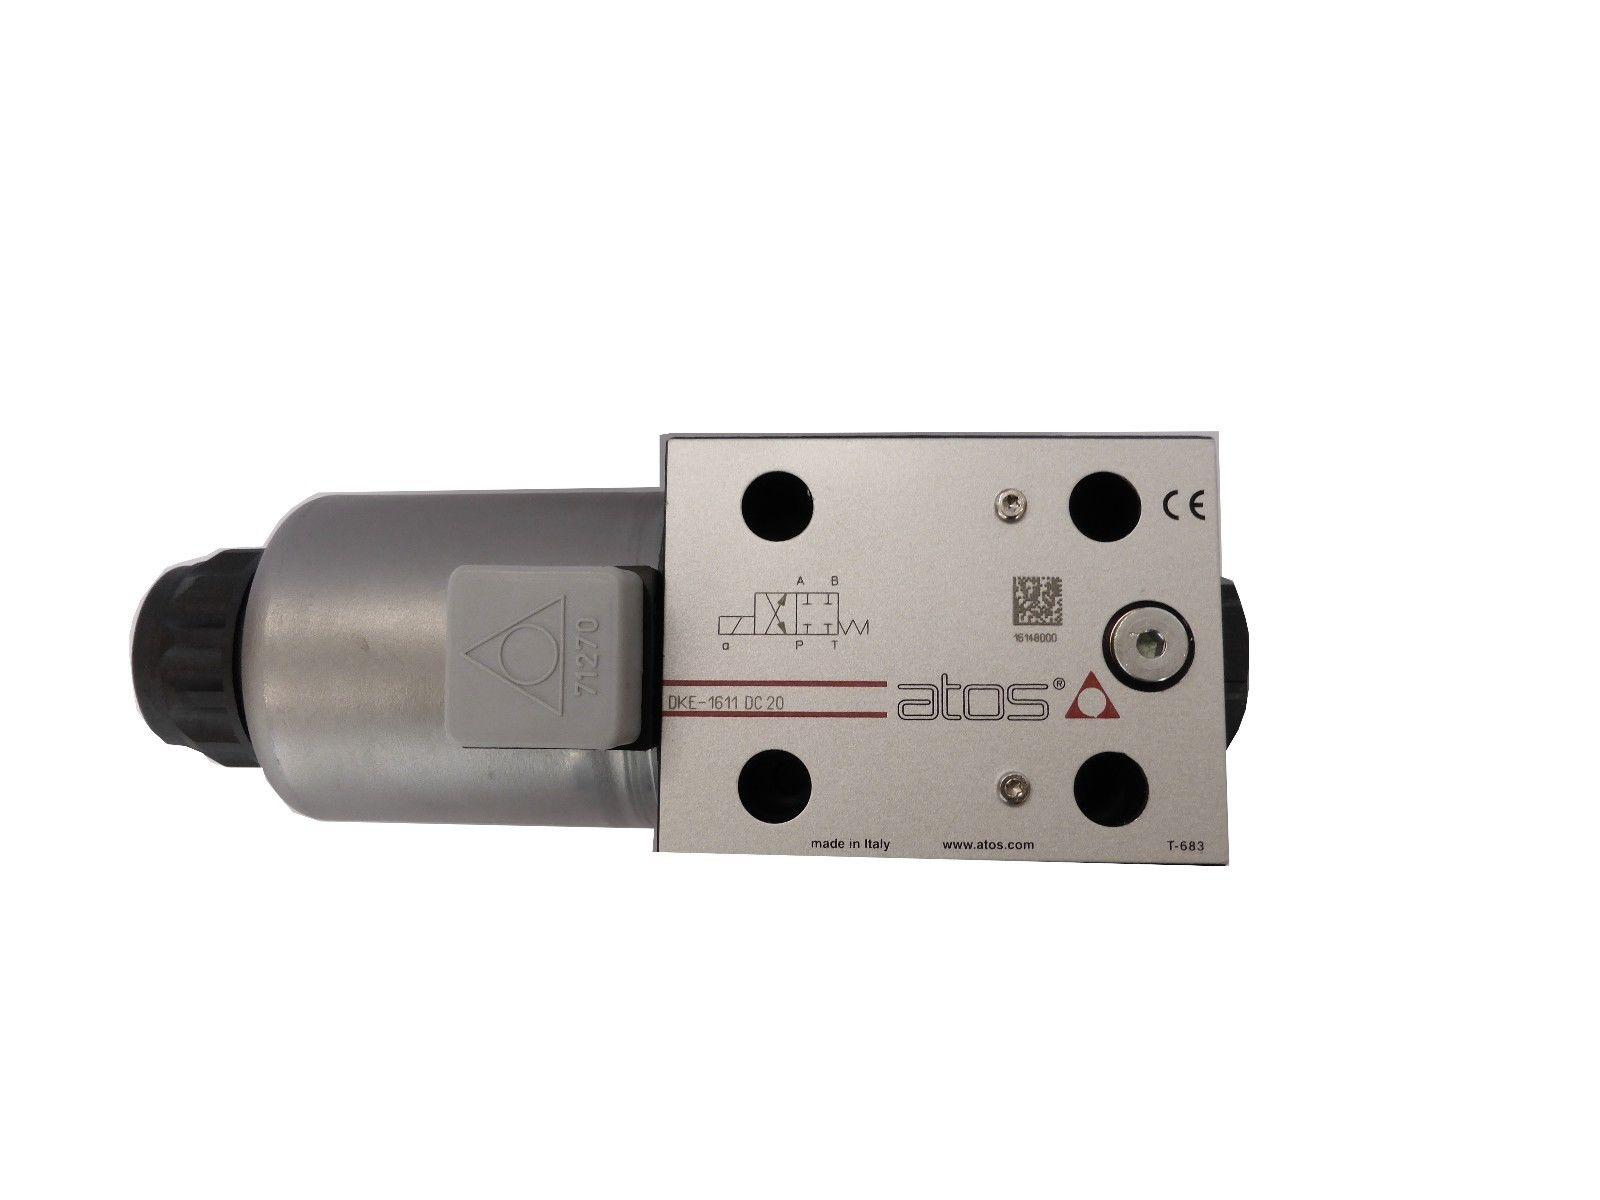 DKE-1713-X 24DC Atos Magnet-Wege-Ventil  NG10 directional valve